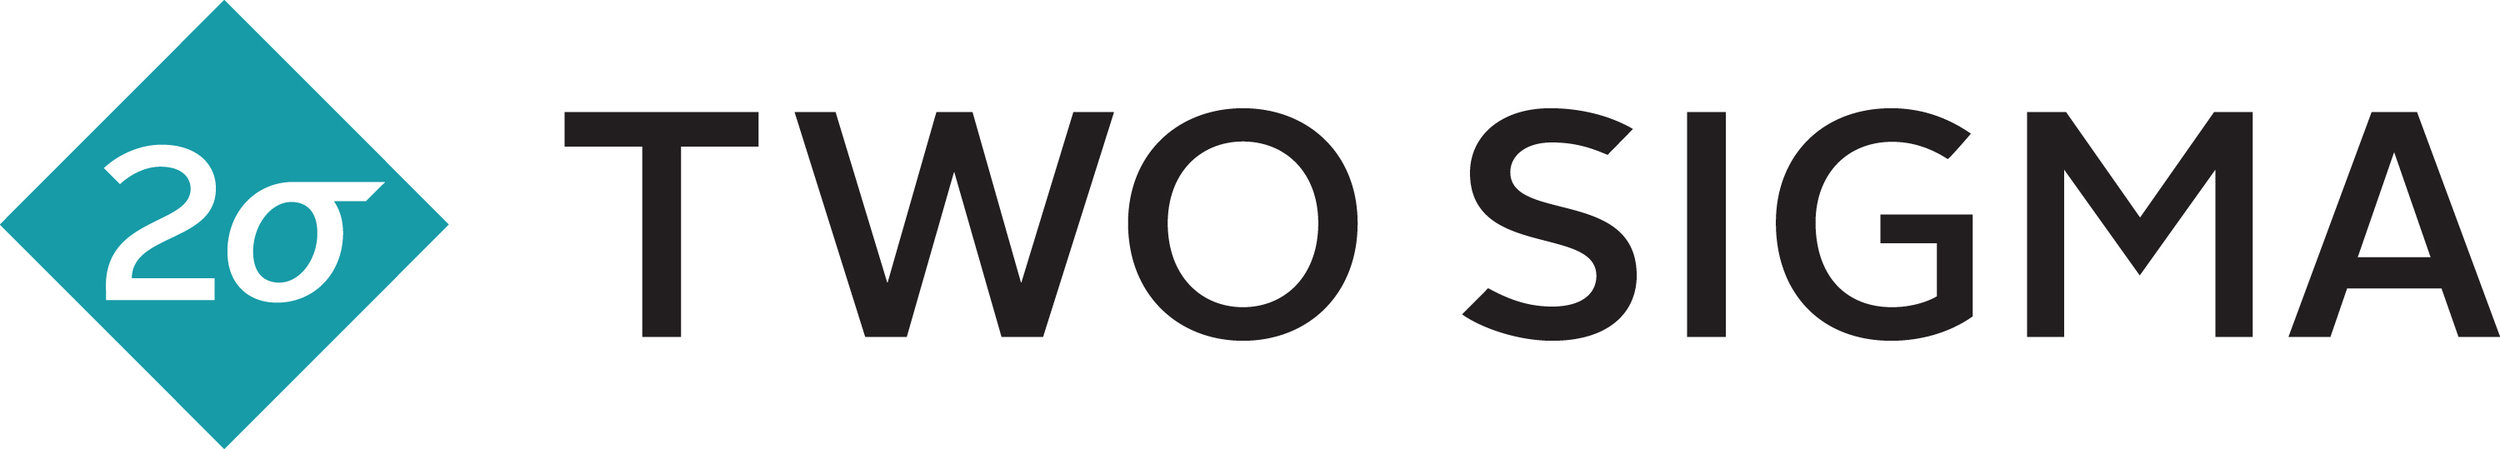 TwoSigma_Logo_RGB.jpg